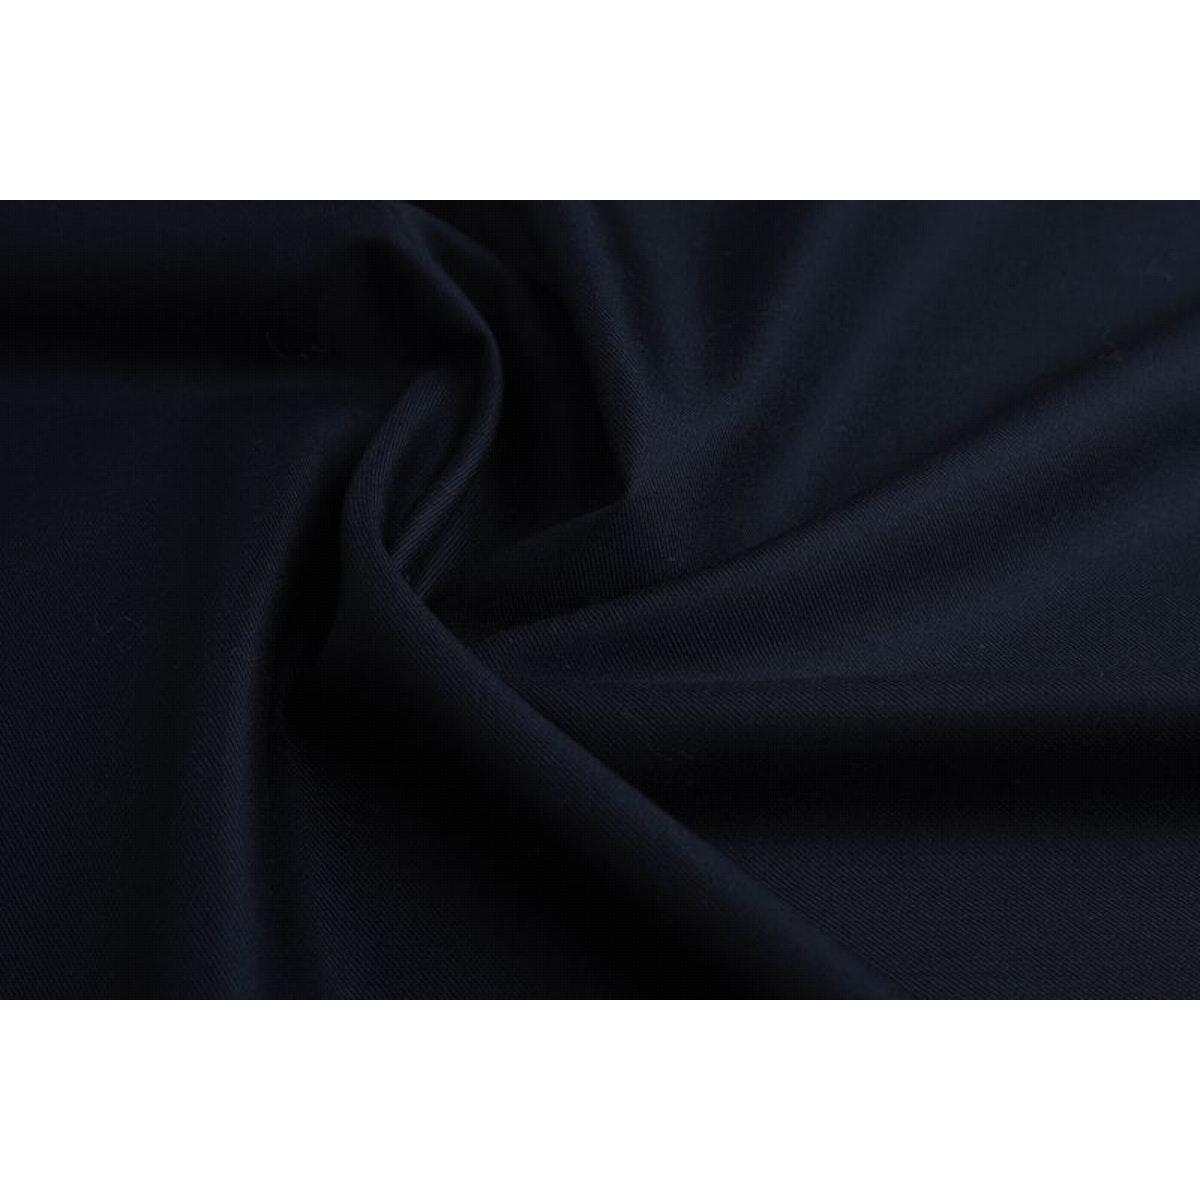 InStitchu Suit Fabric 20